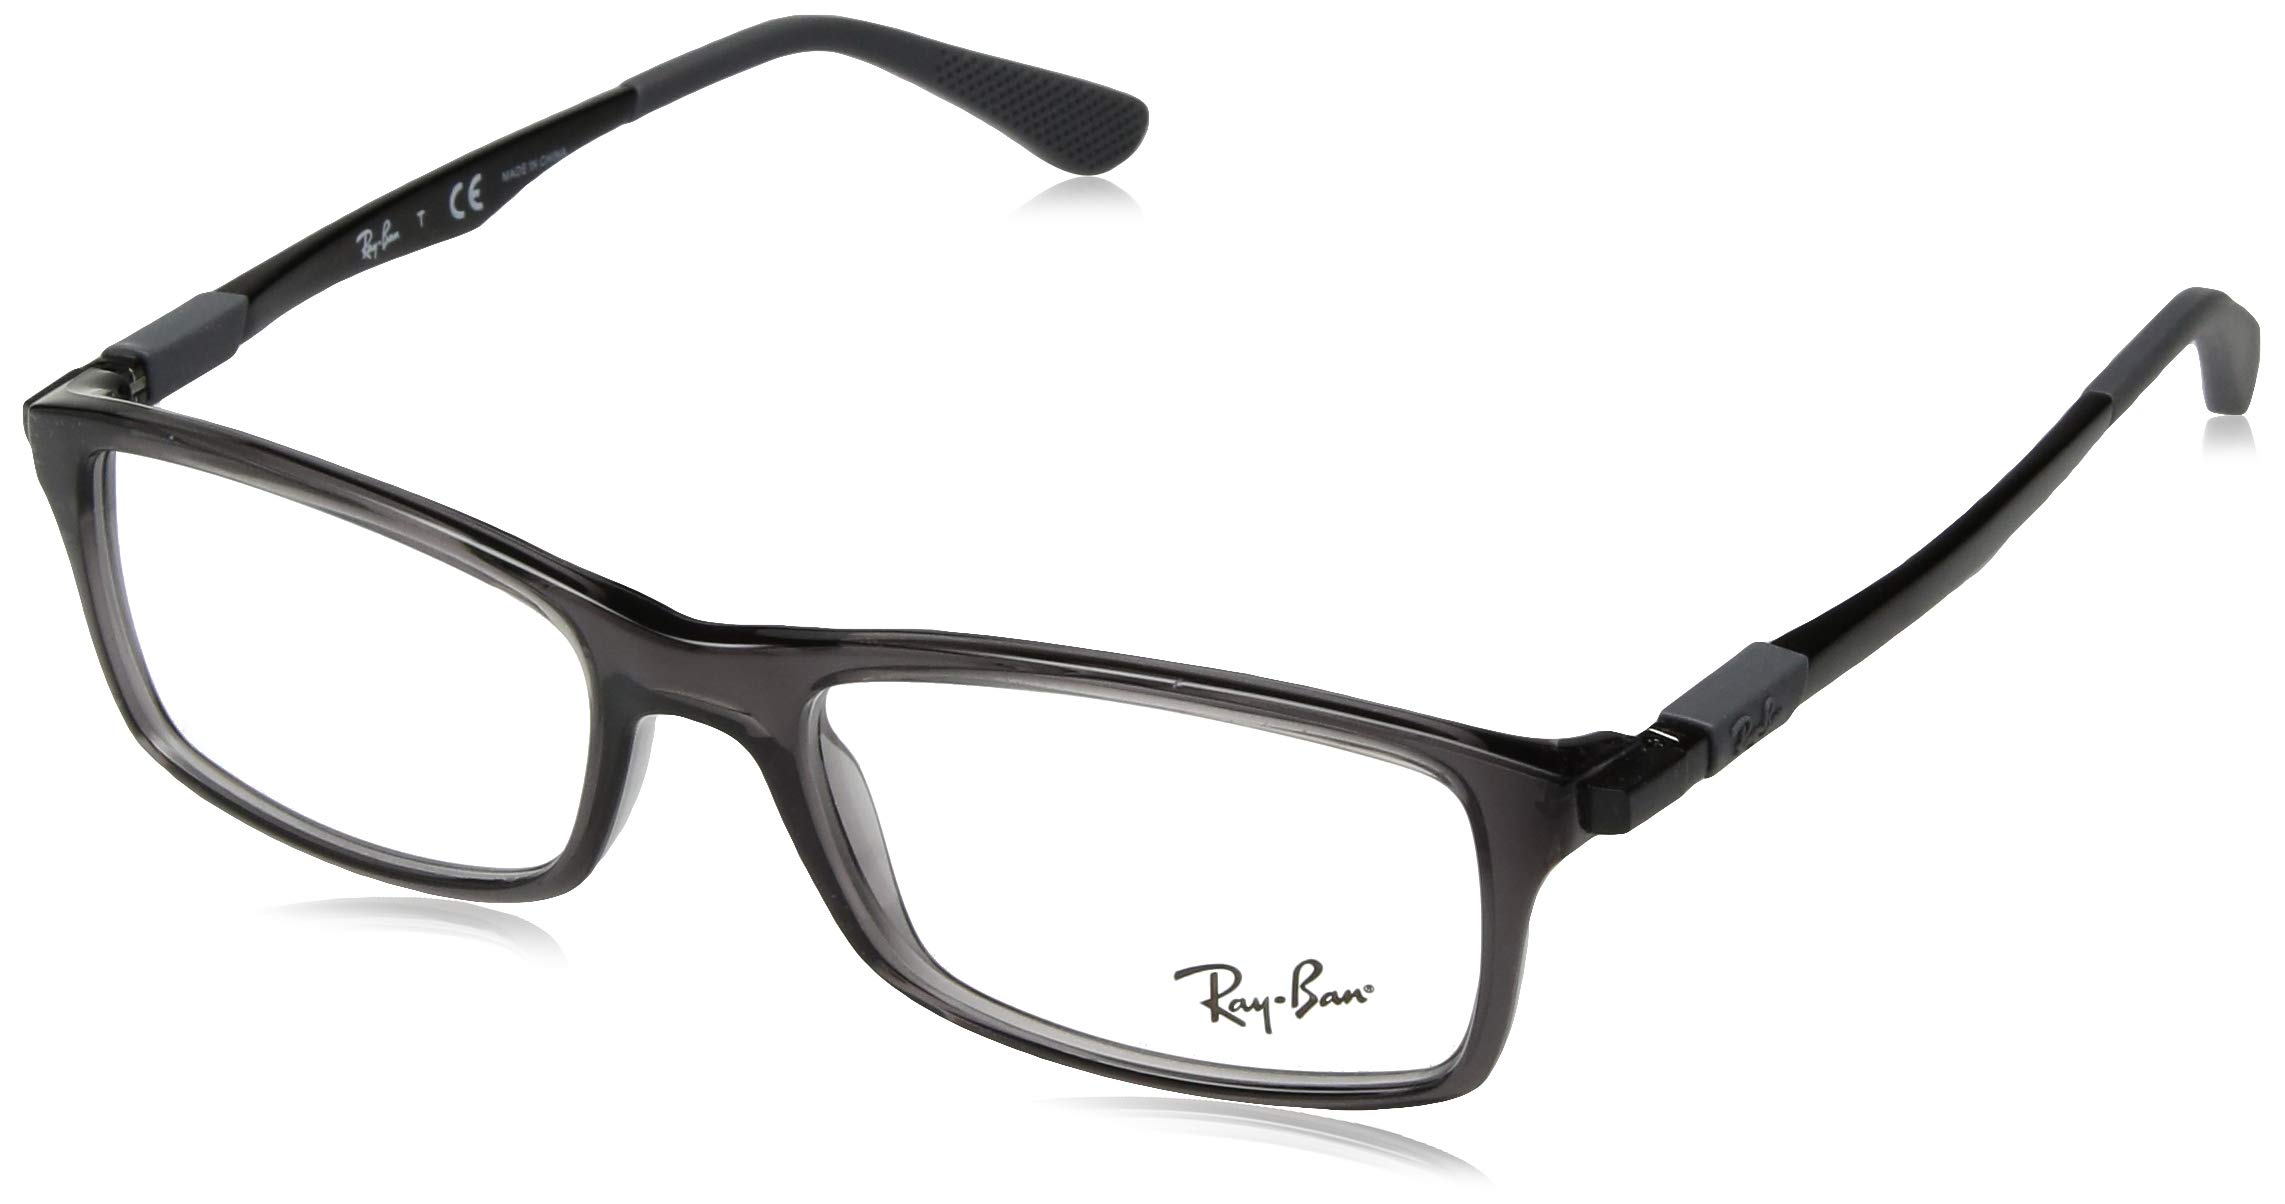 Ray-Ban RX7017 Rectangular Eyeglass Frames, Transparent Grey/Demo Lens, 54 mm